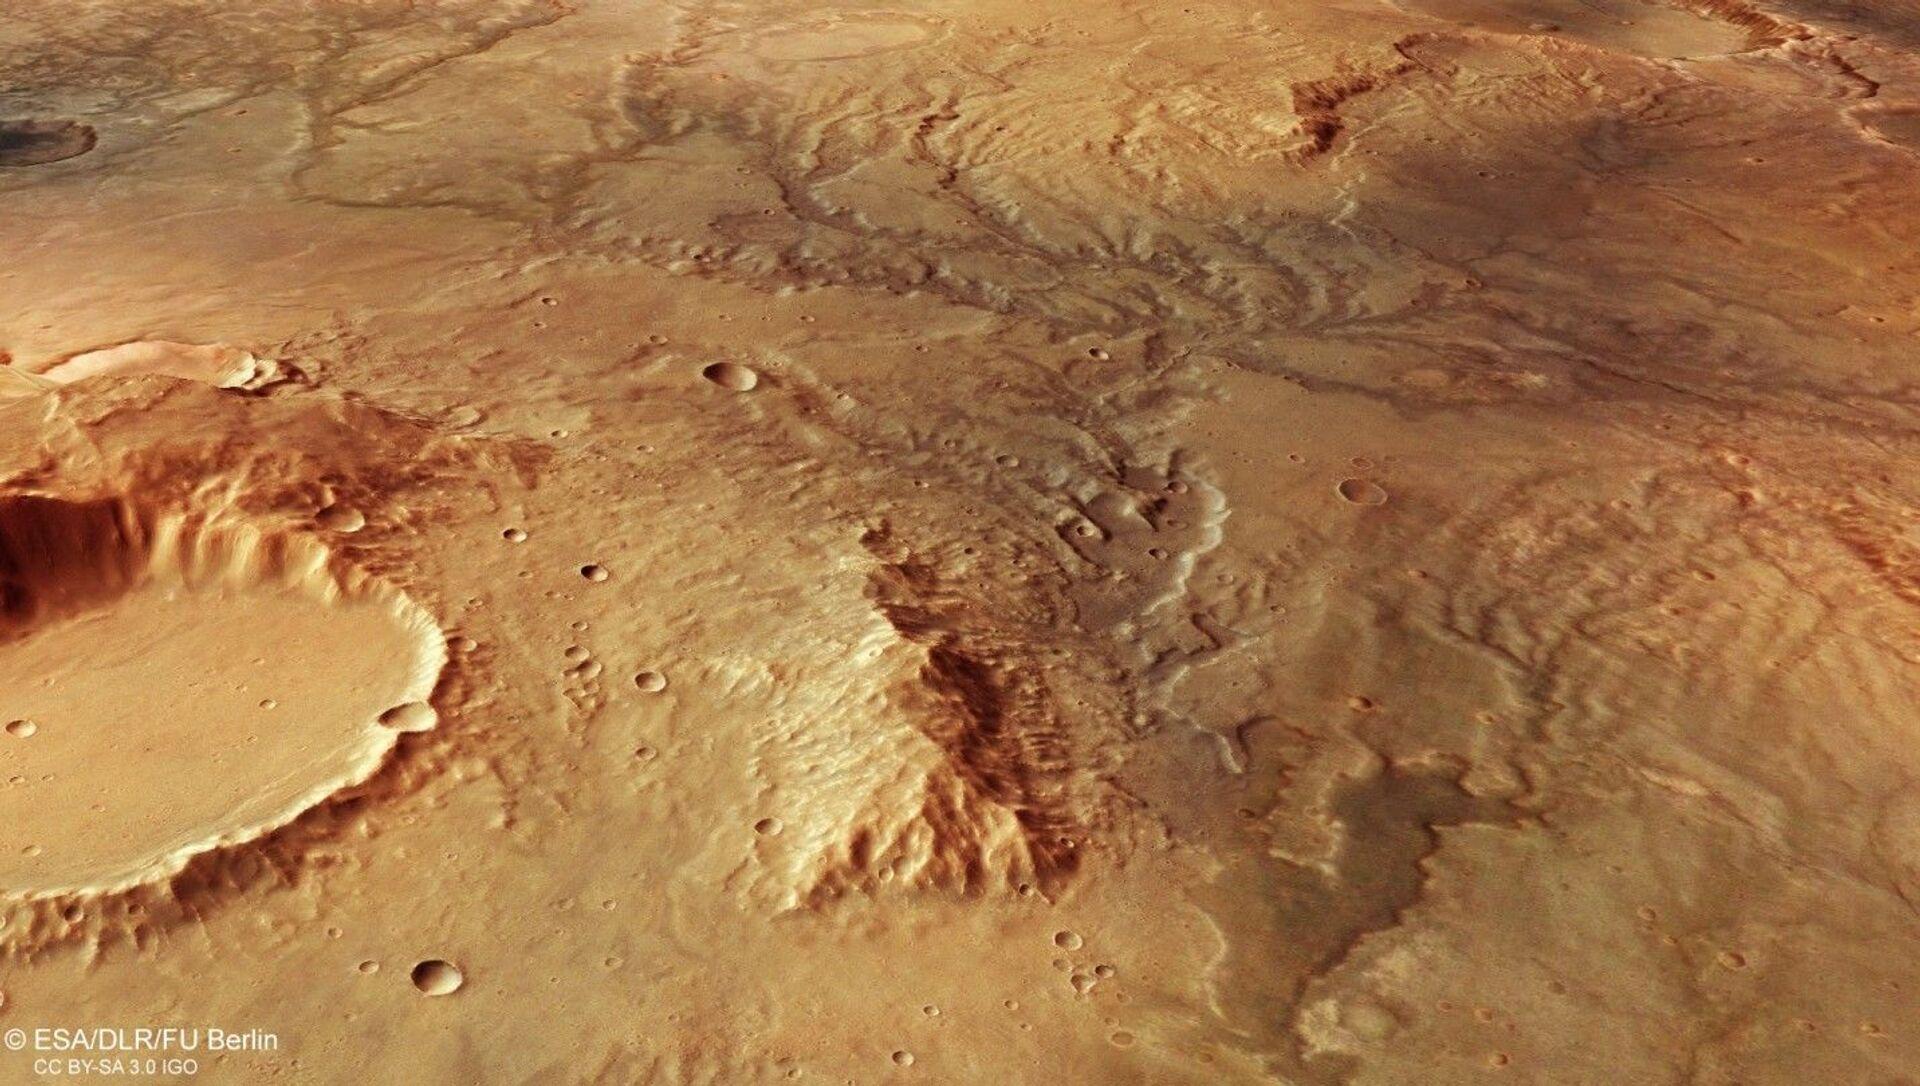 Esa Mars Express fotografa un antico fiume estinto su Marte - Sputnik Italia, 1920, 13.04.2021